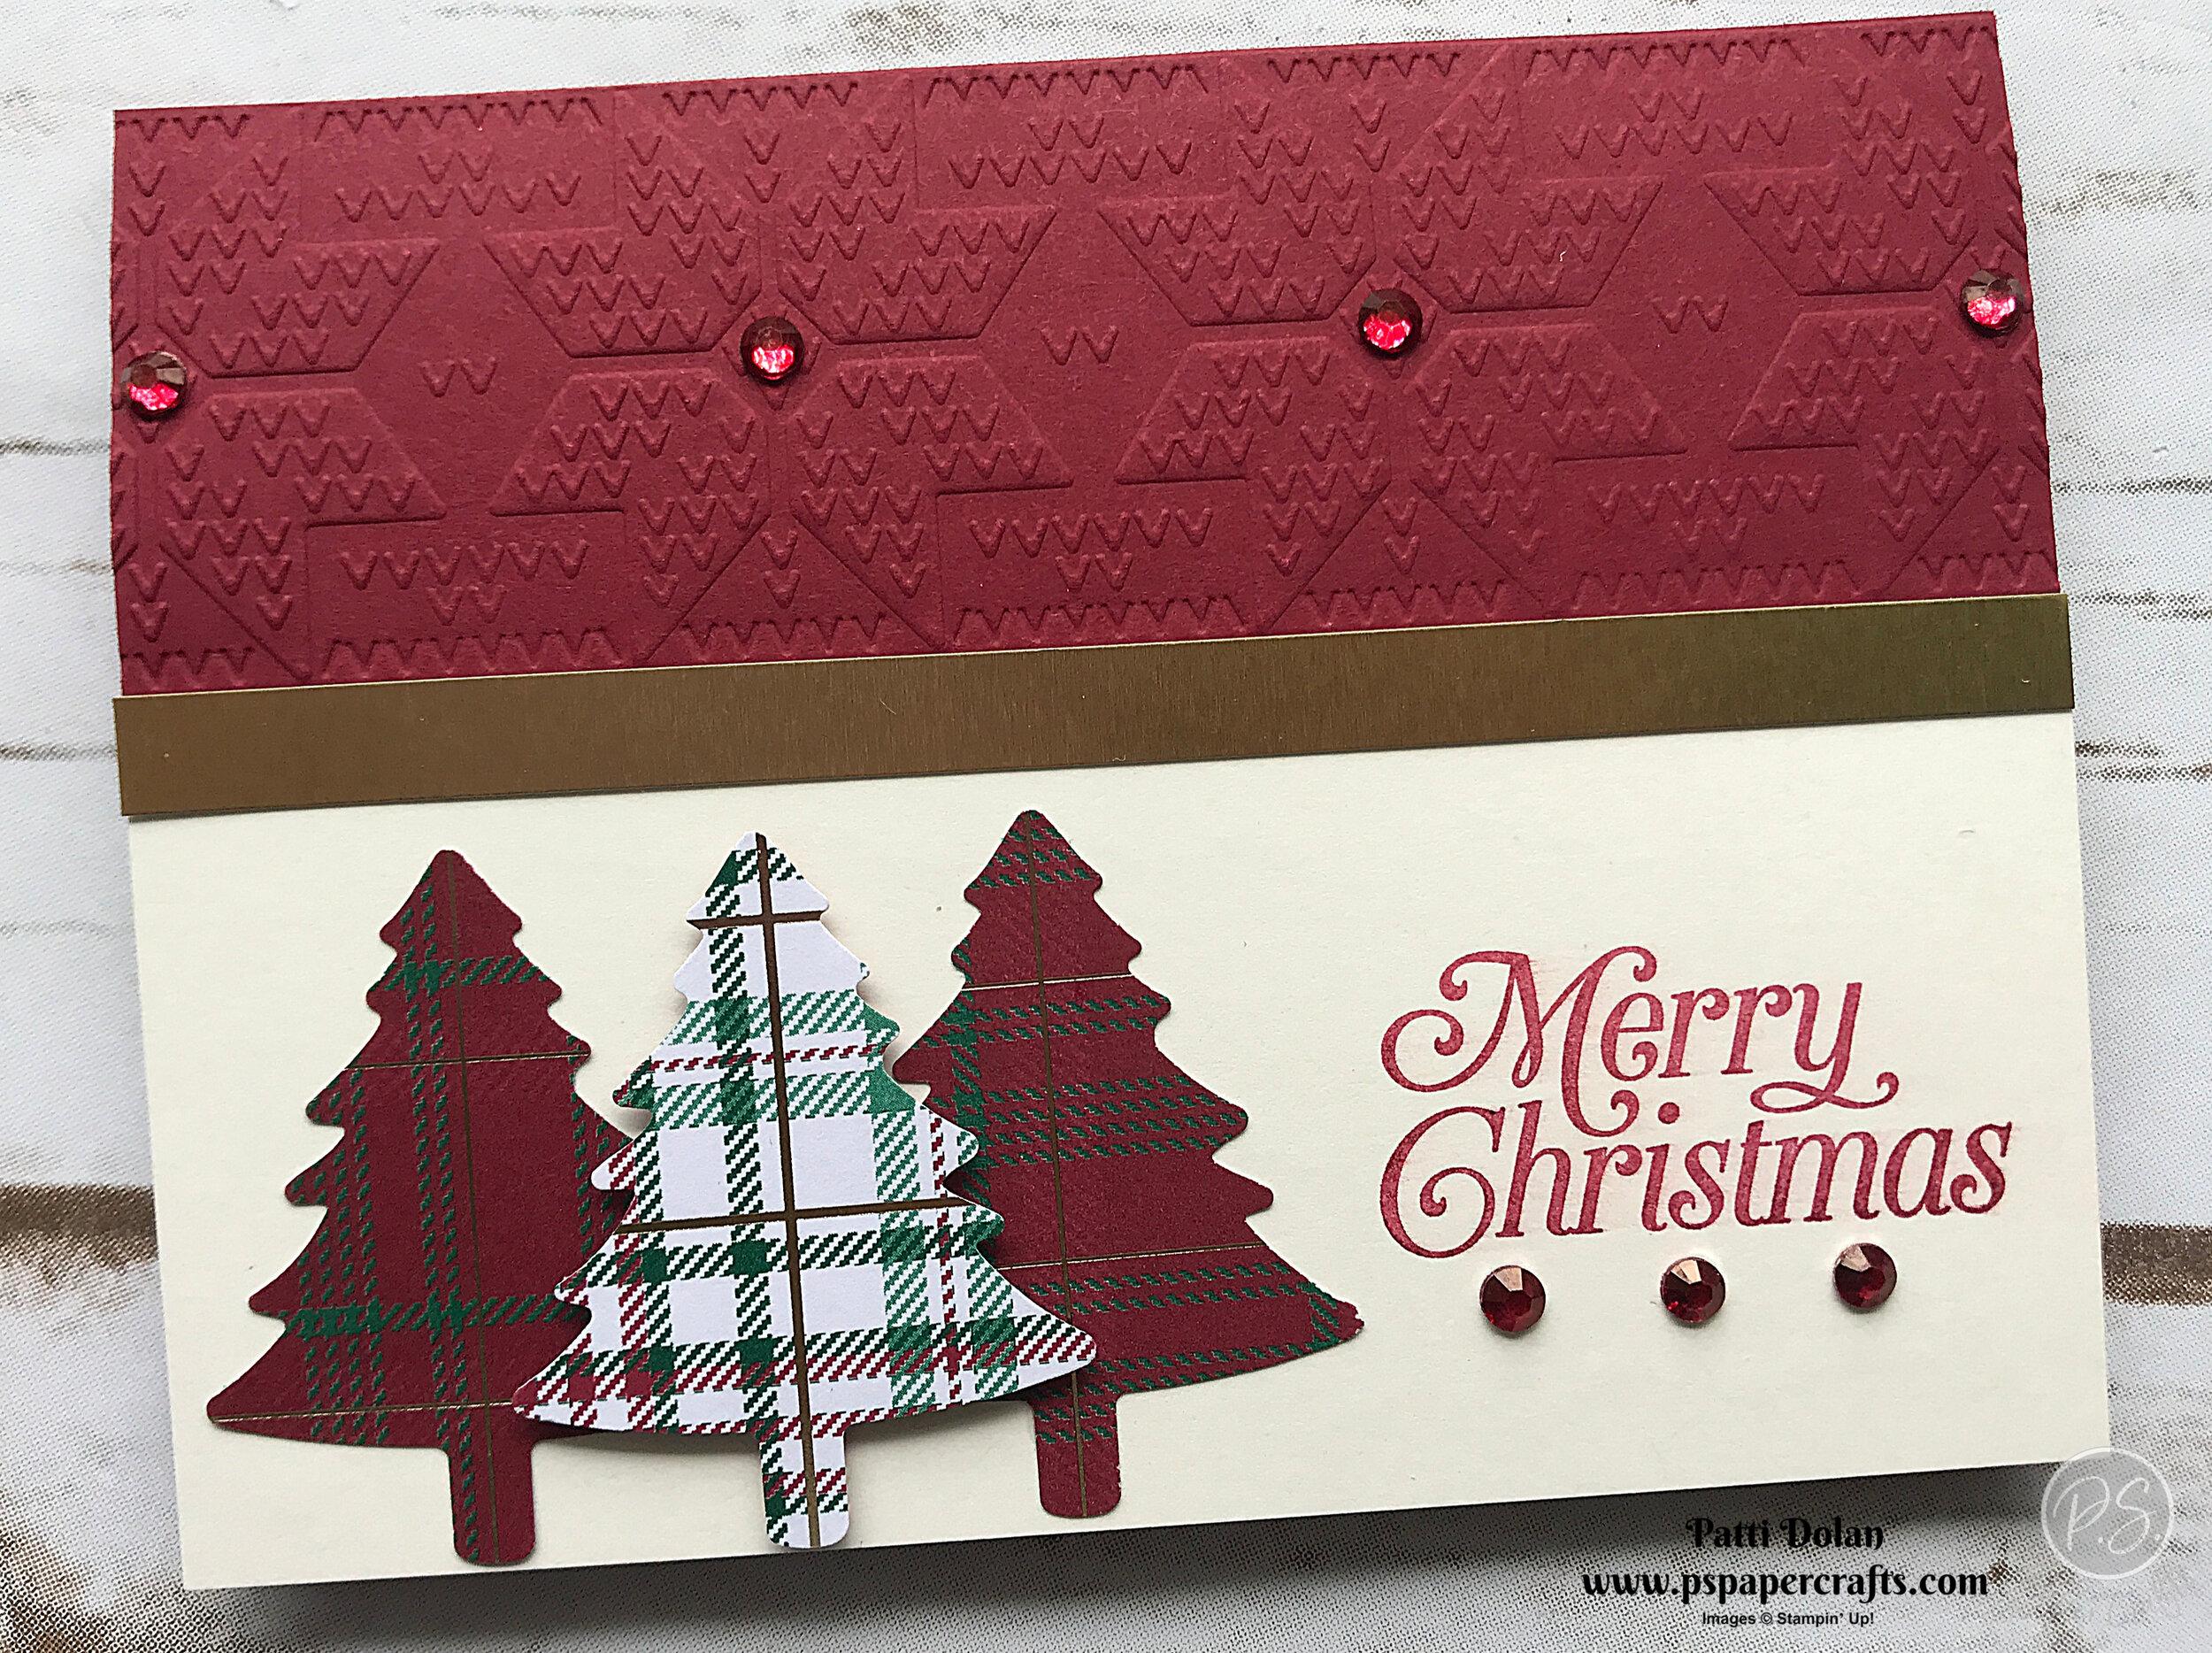 Perfectly Plaid Winter Knit Card2.jpg